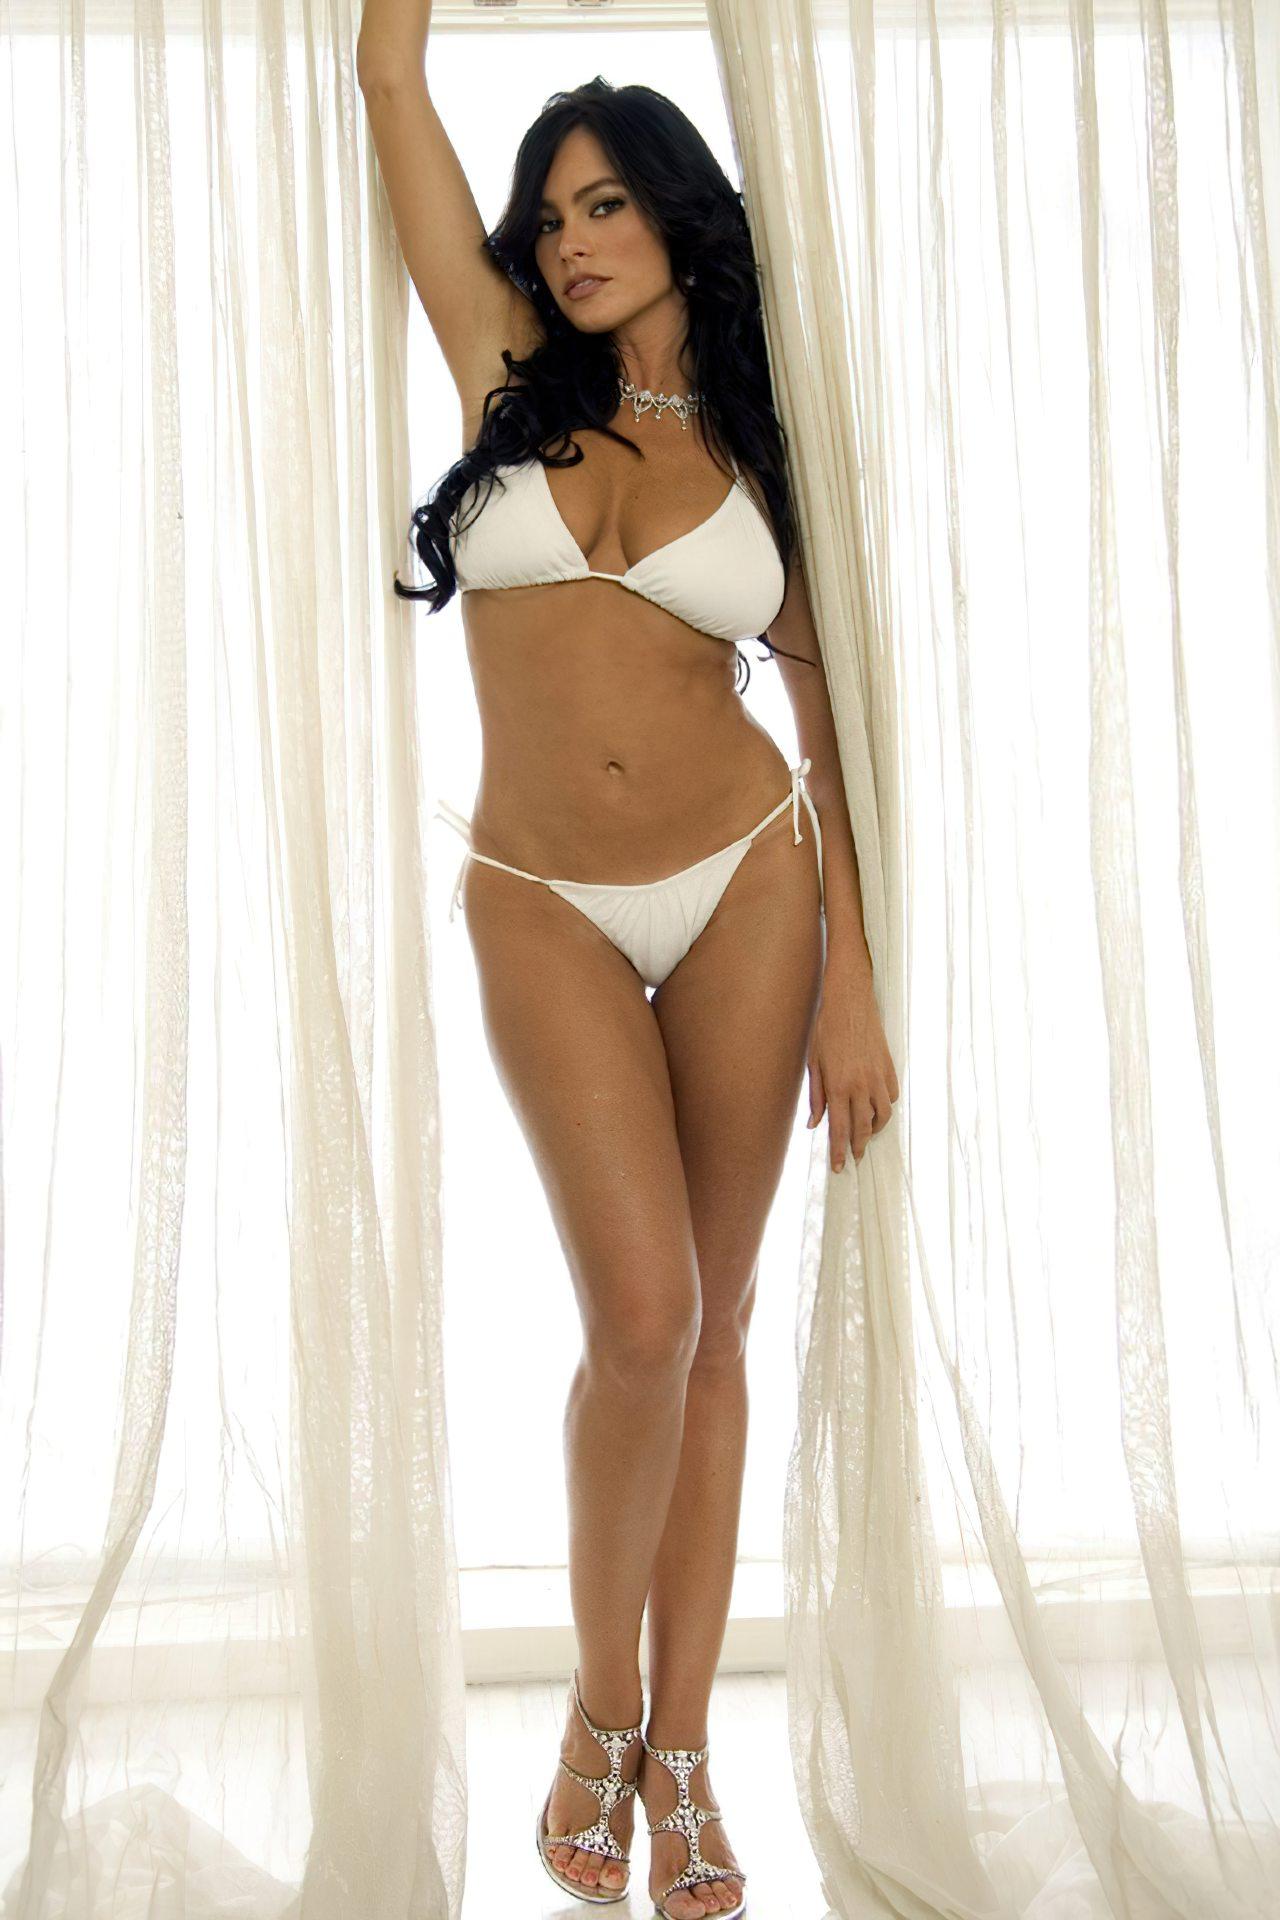 Sofia Vegara